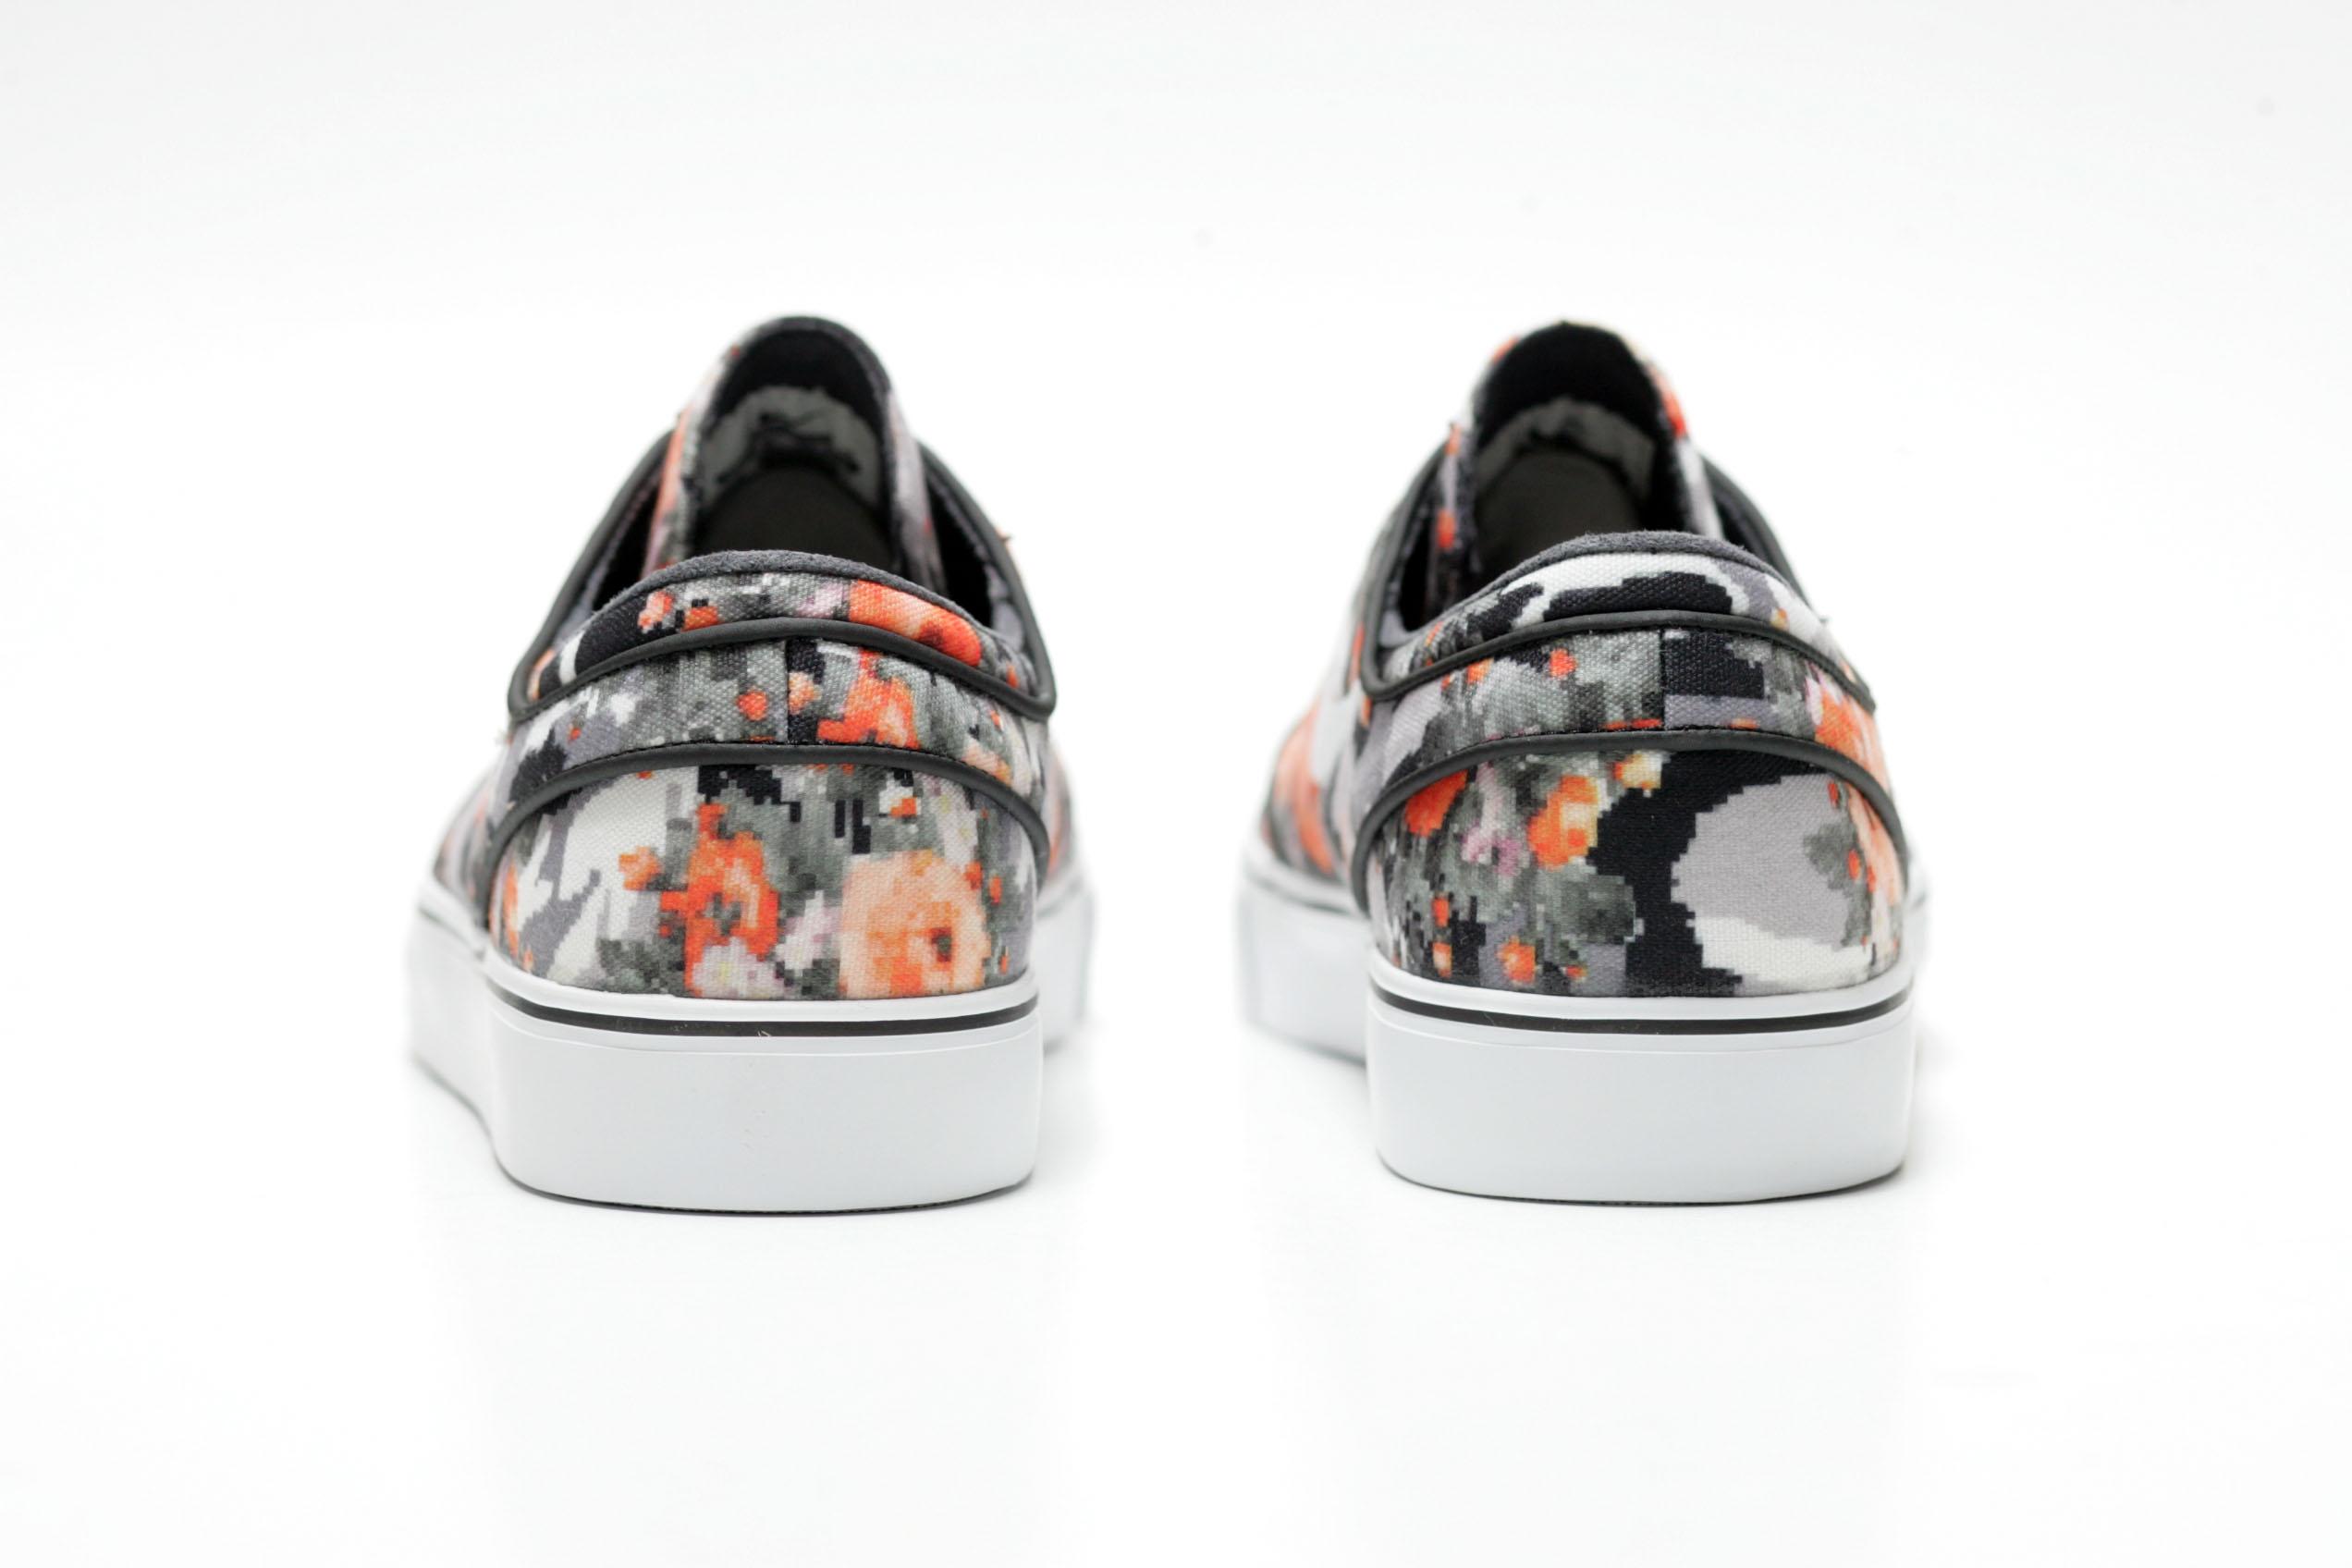 nike-sb-stefan-janoski-digi-floral-qs-multi-color-black-mandarin-release-date-info-5